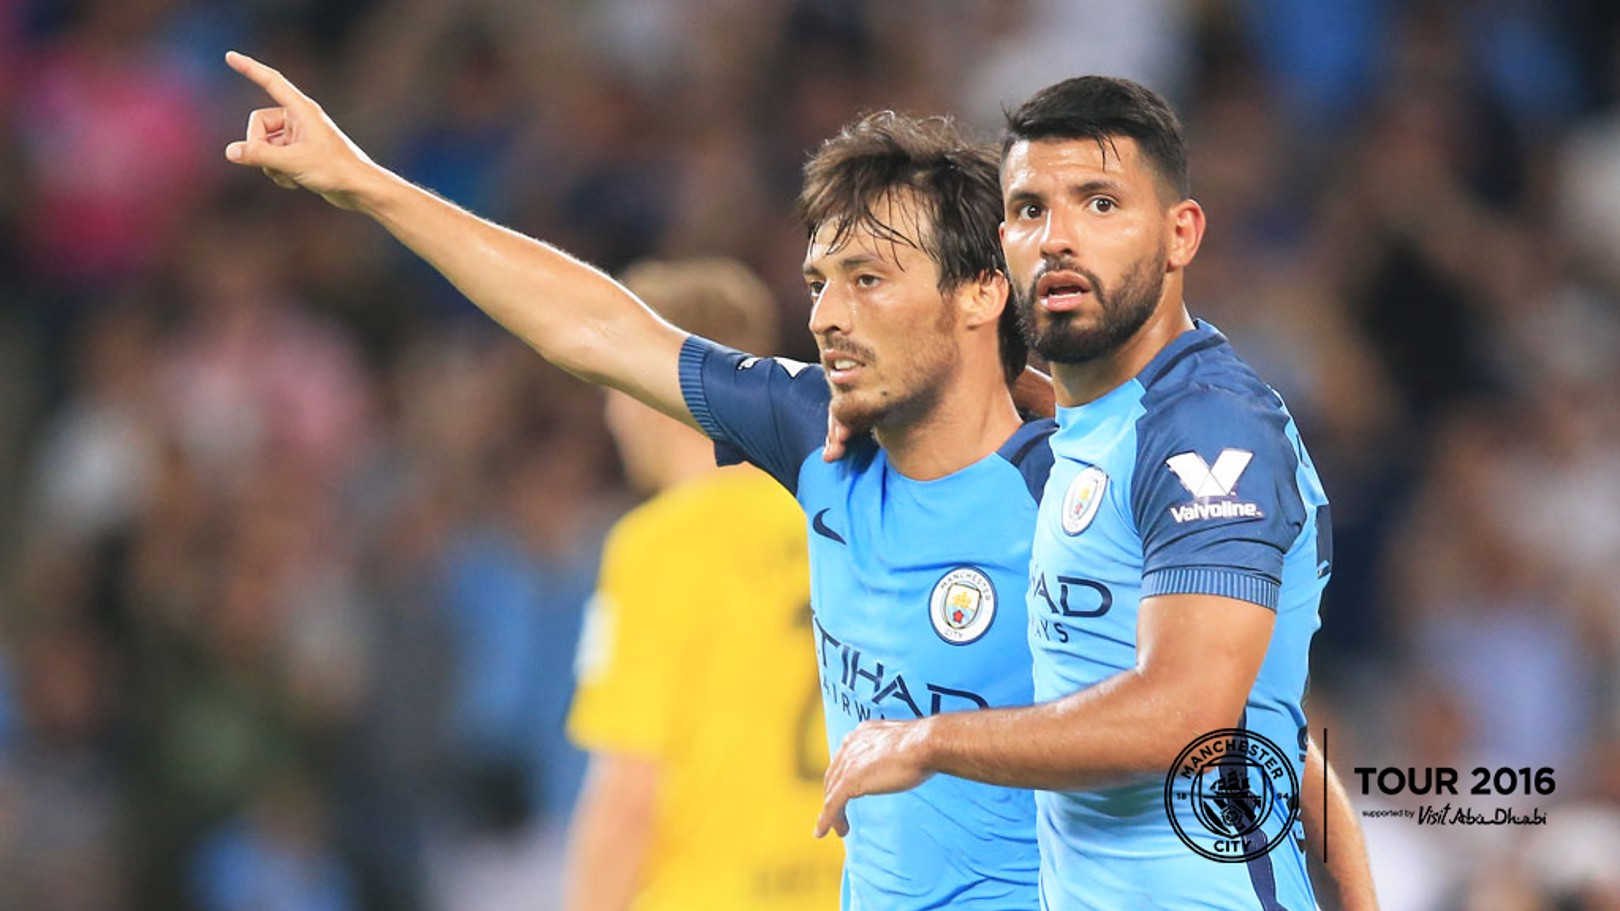 DOUBLE TROUBLE: Will Sergio and Silva shine in Sweden?